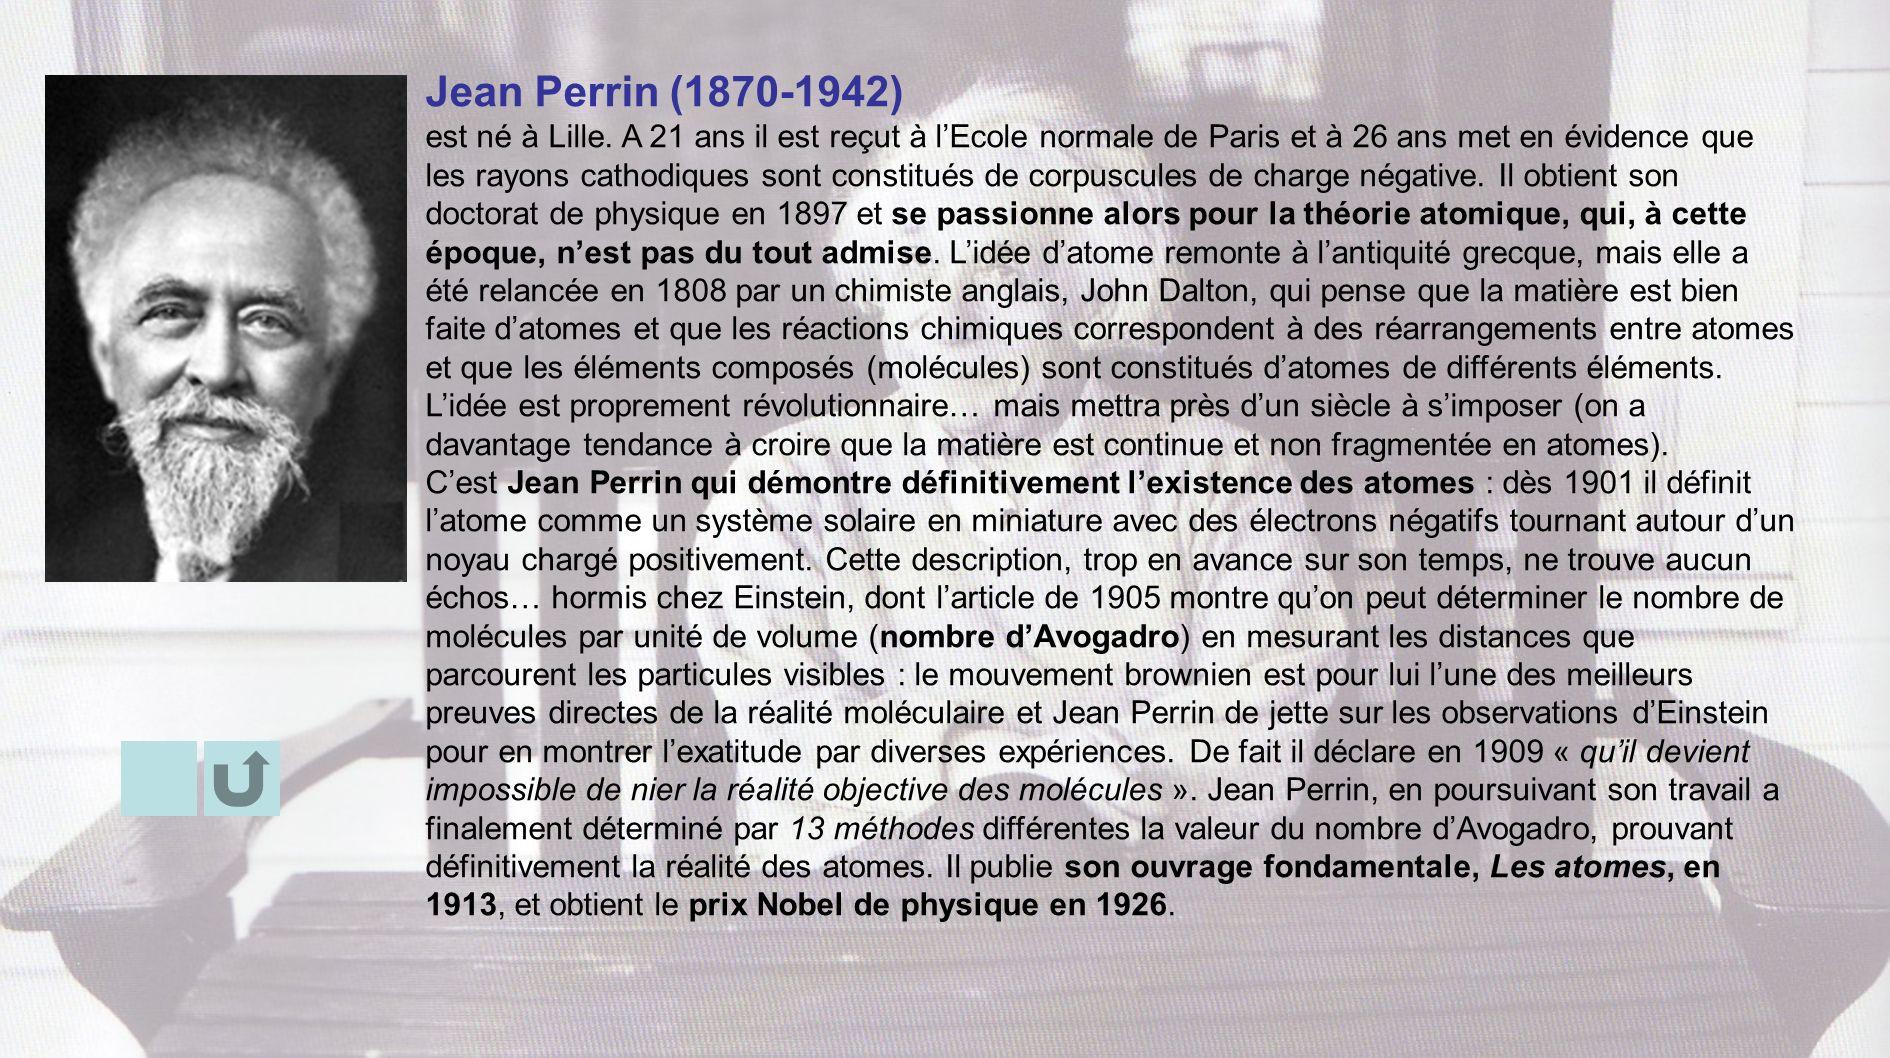 Jean Perrin (1870-1942)